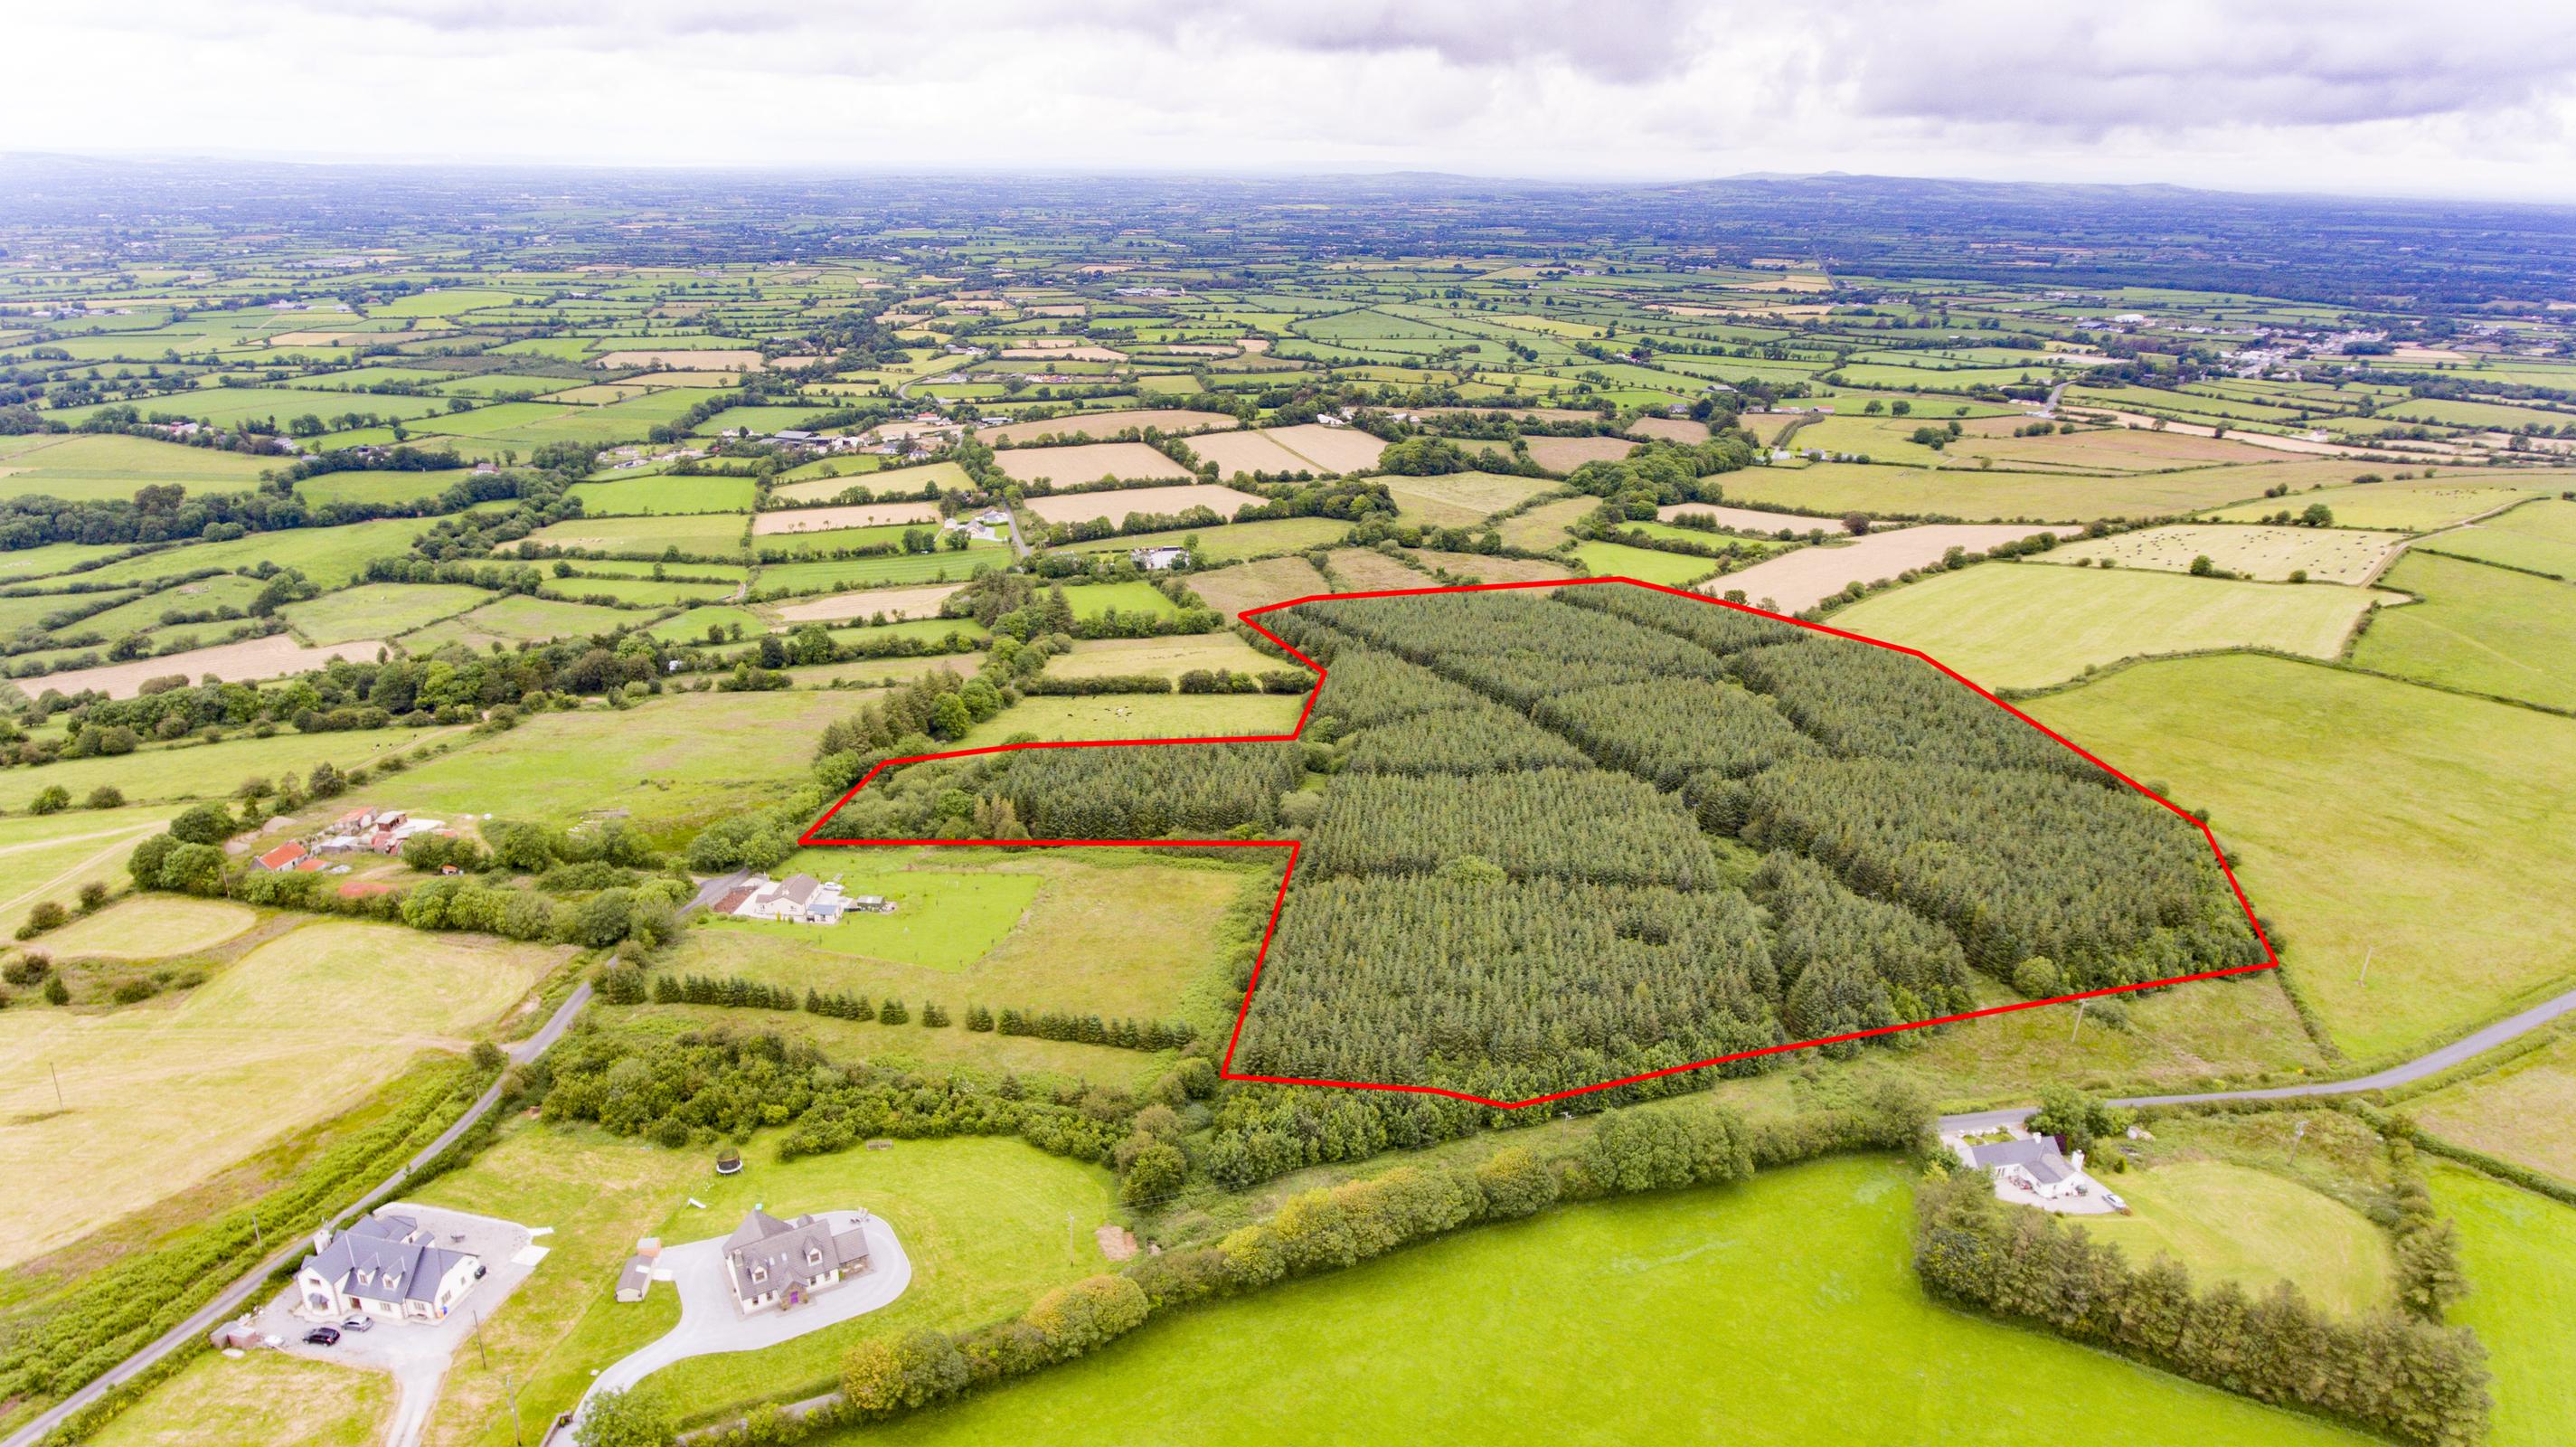 Mountplummer, Broadford, Co. Limerick